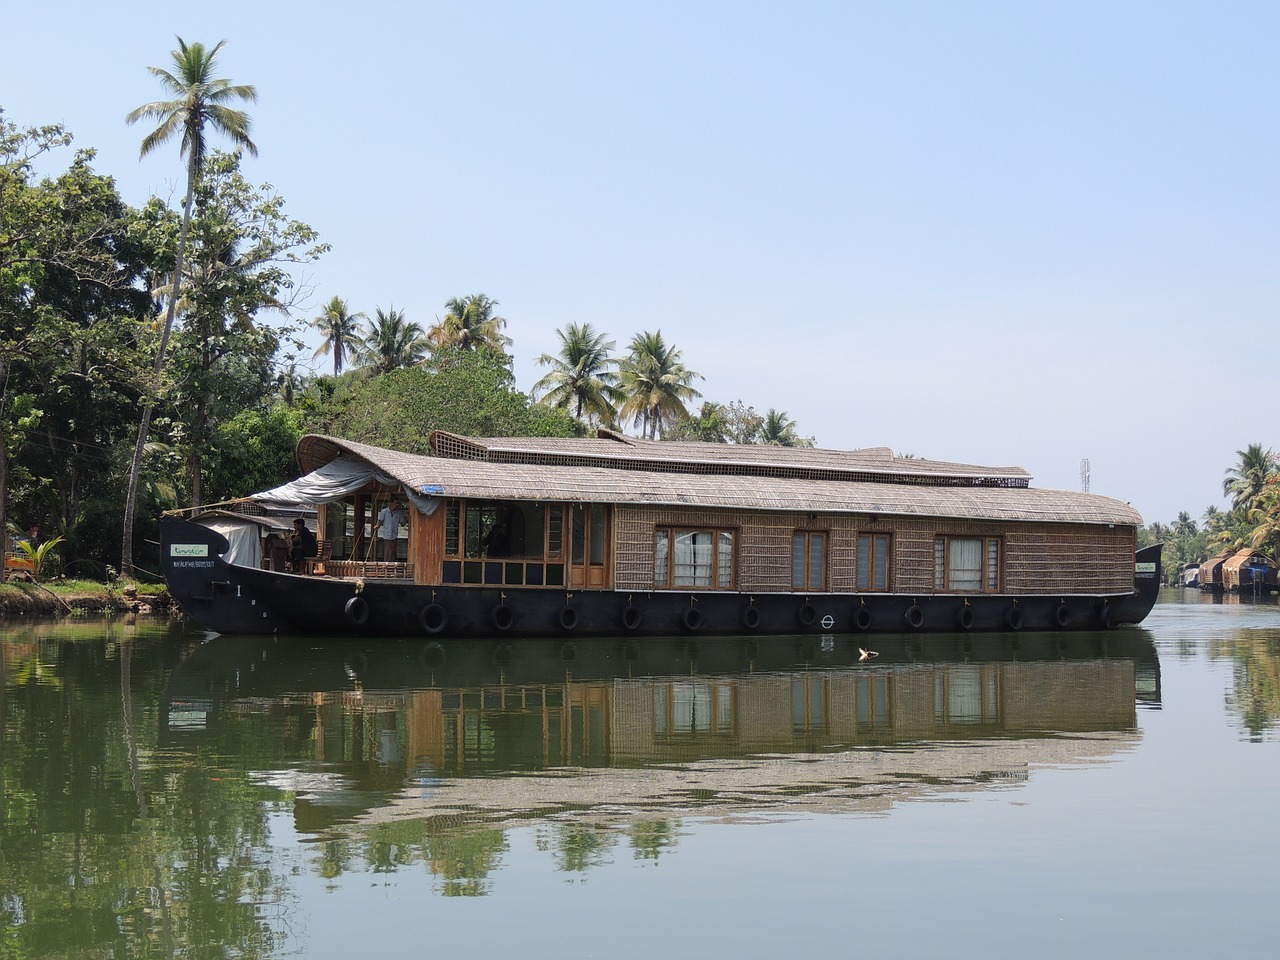 Alappuzha - Weekend Getaways Within 350 km of Wayanad